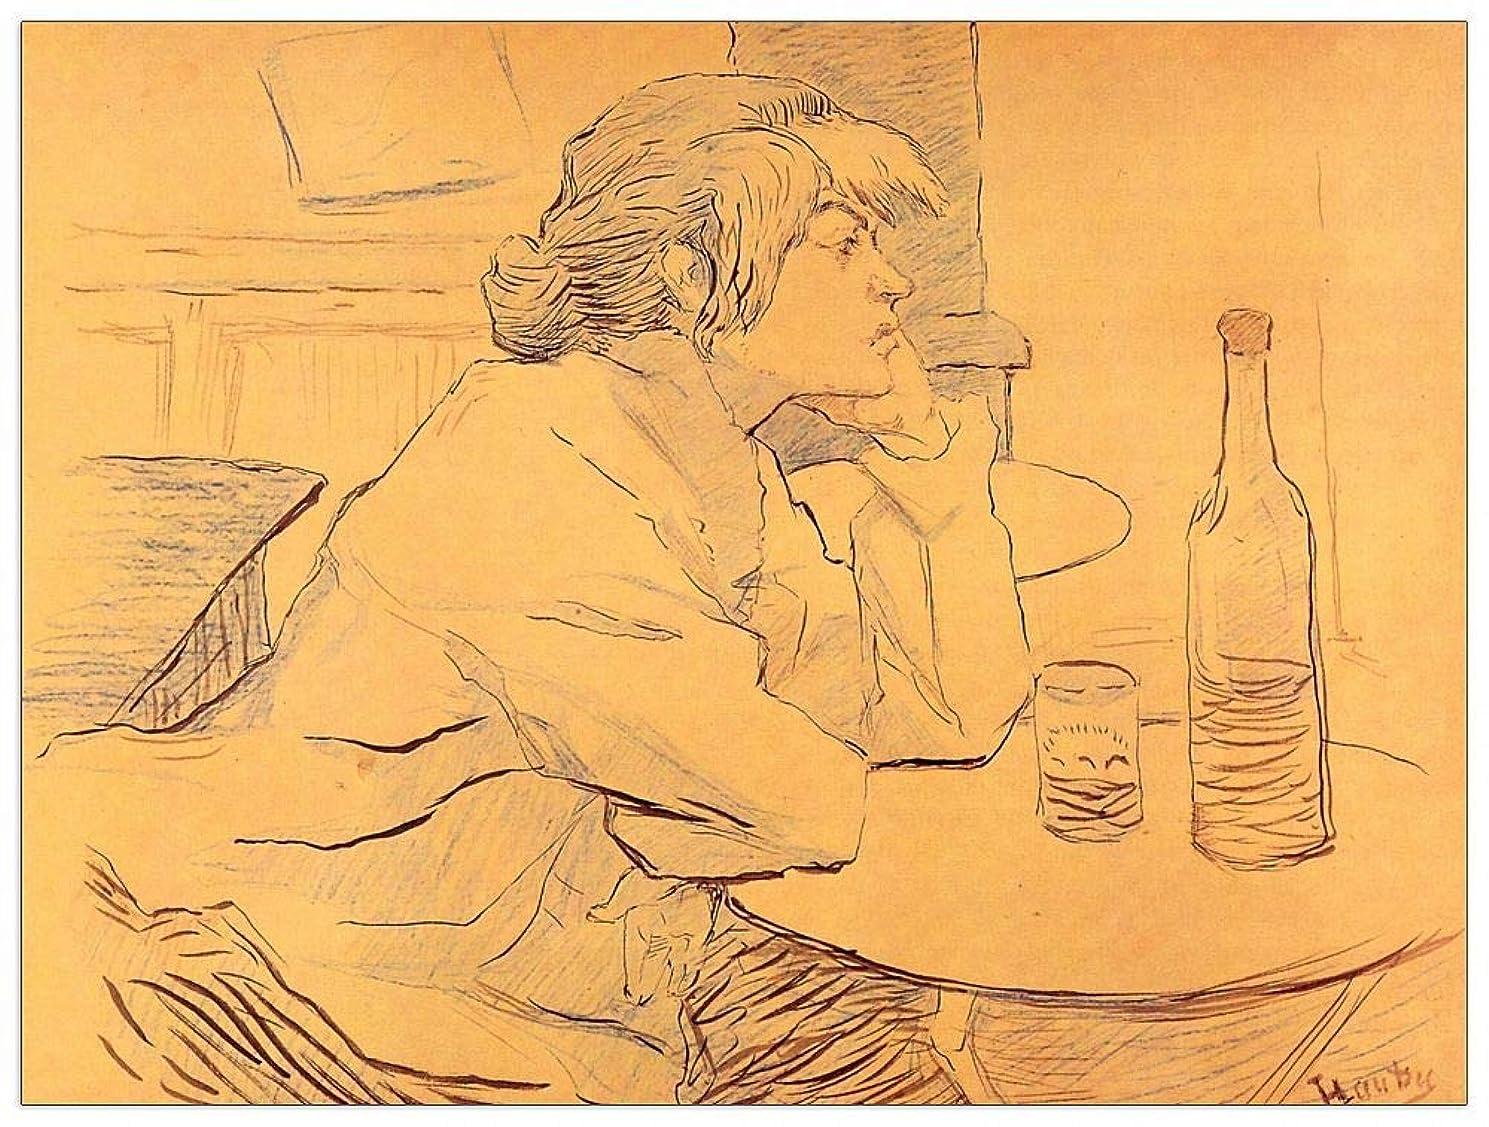 ArtPlaza TW92707 Toulouse-Lautrec-The Hangover Decorative Panel, 35.5x27.5 Inch, Multicolored